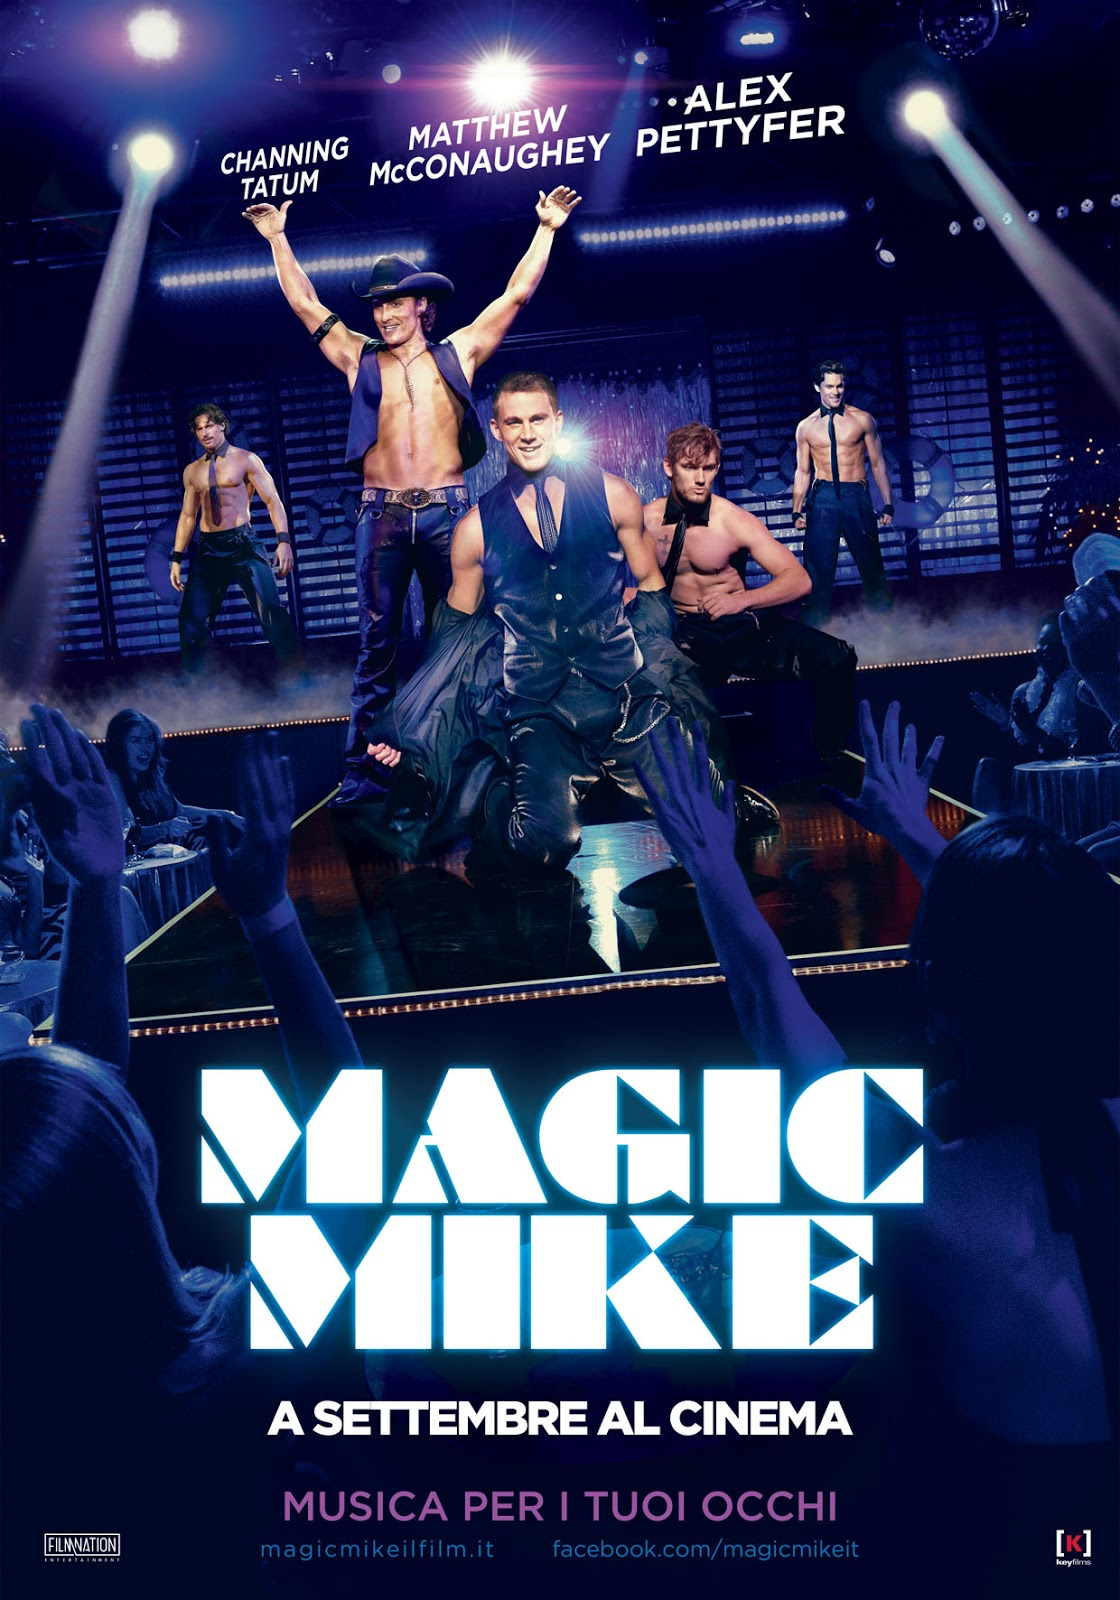 http://1.bp.blogspot.com/-y-D7QtWLiFQ/UJ5Ej3Iy3nI/AAAAAAAAOqY/TVCHgrLLOe0/s1600/MagicMike_poster.jpg